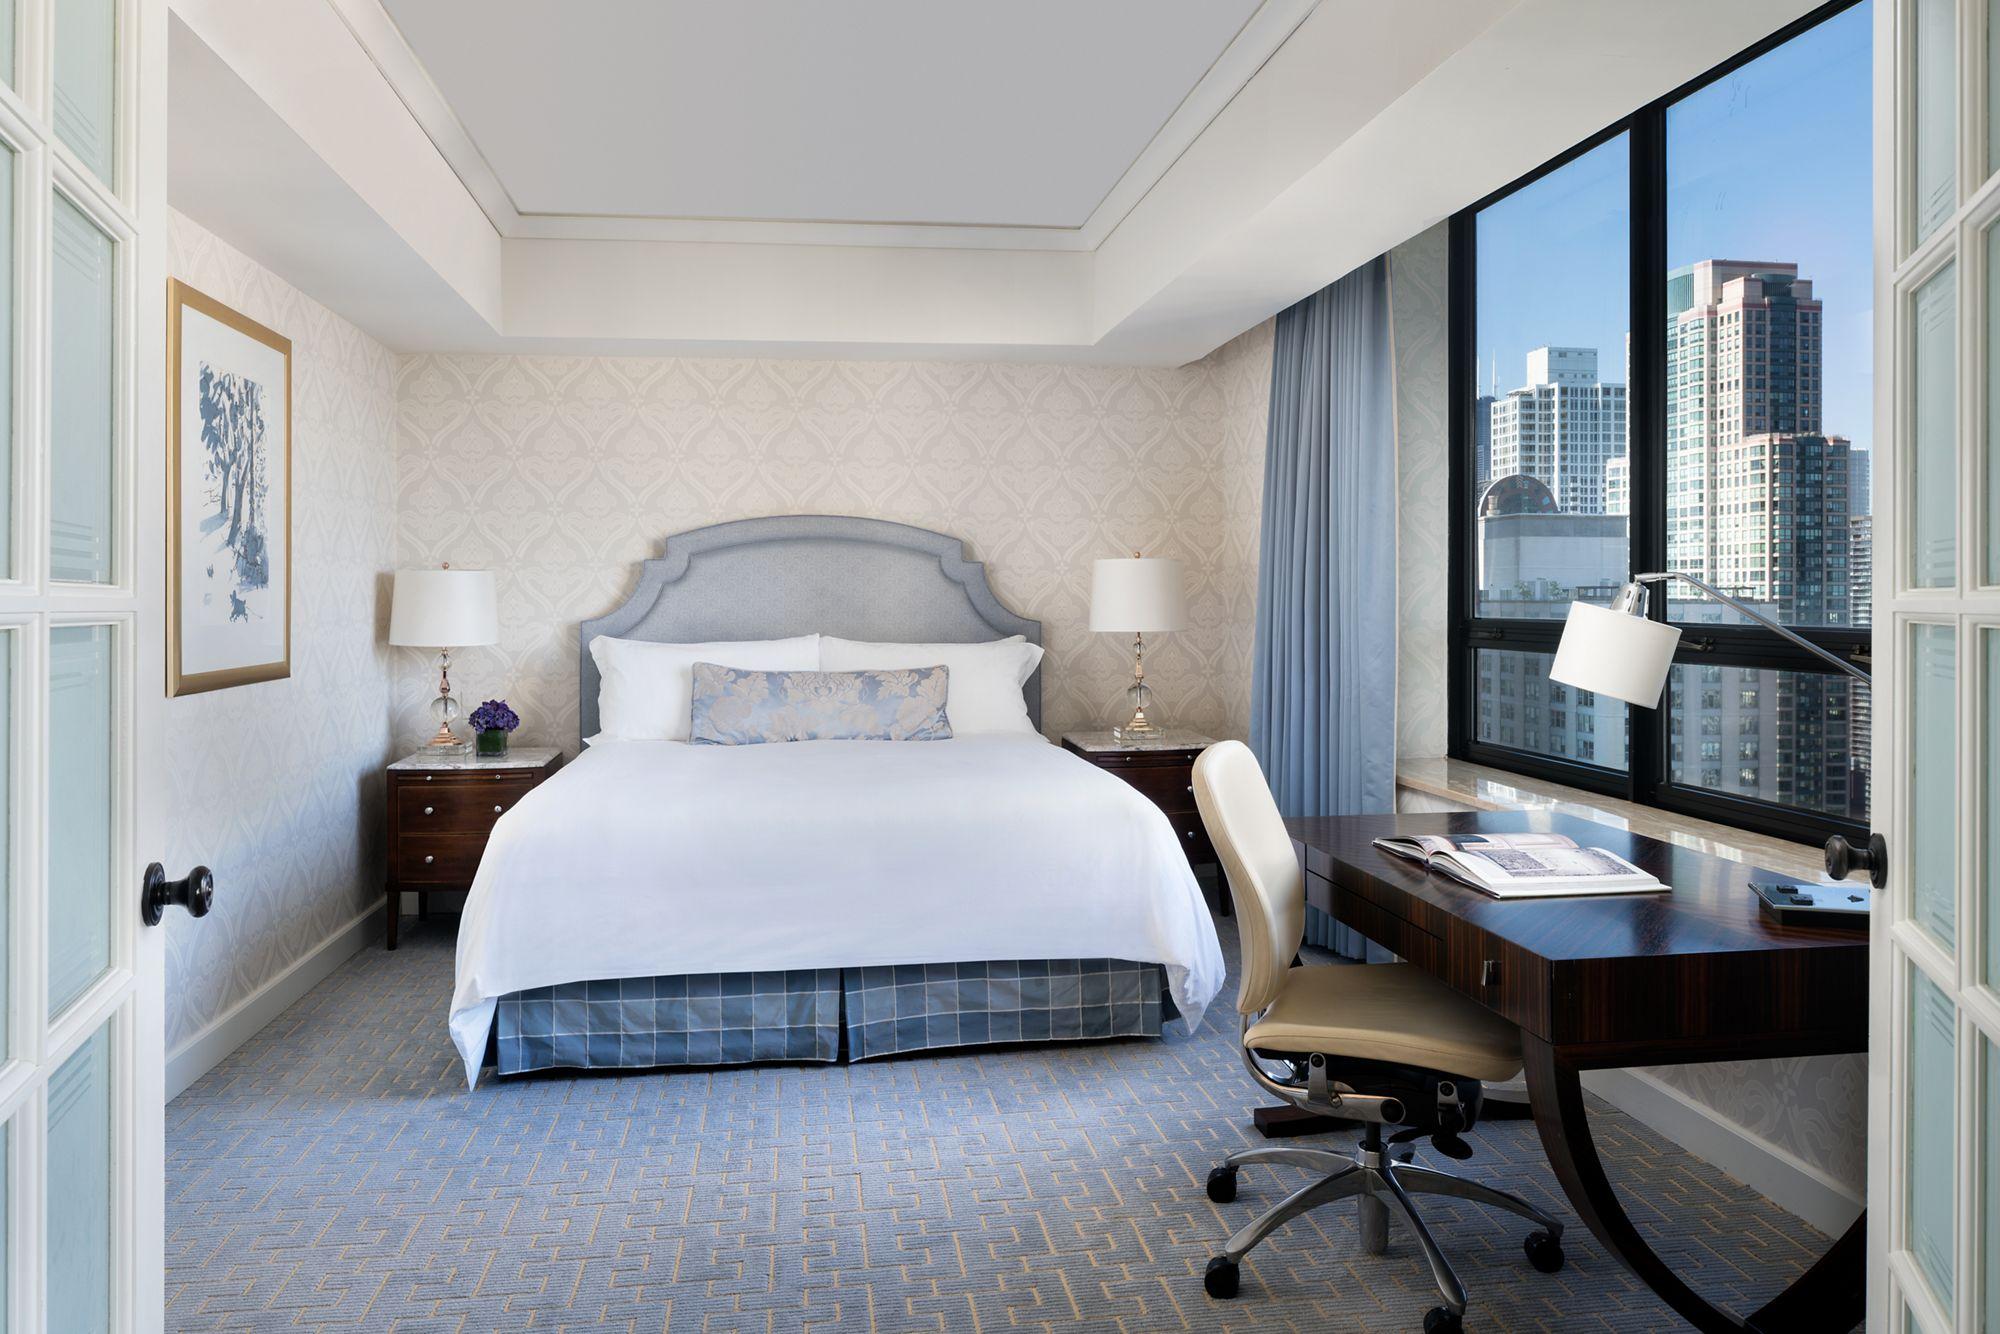 The Ritz-Carlton, Chicago image 4